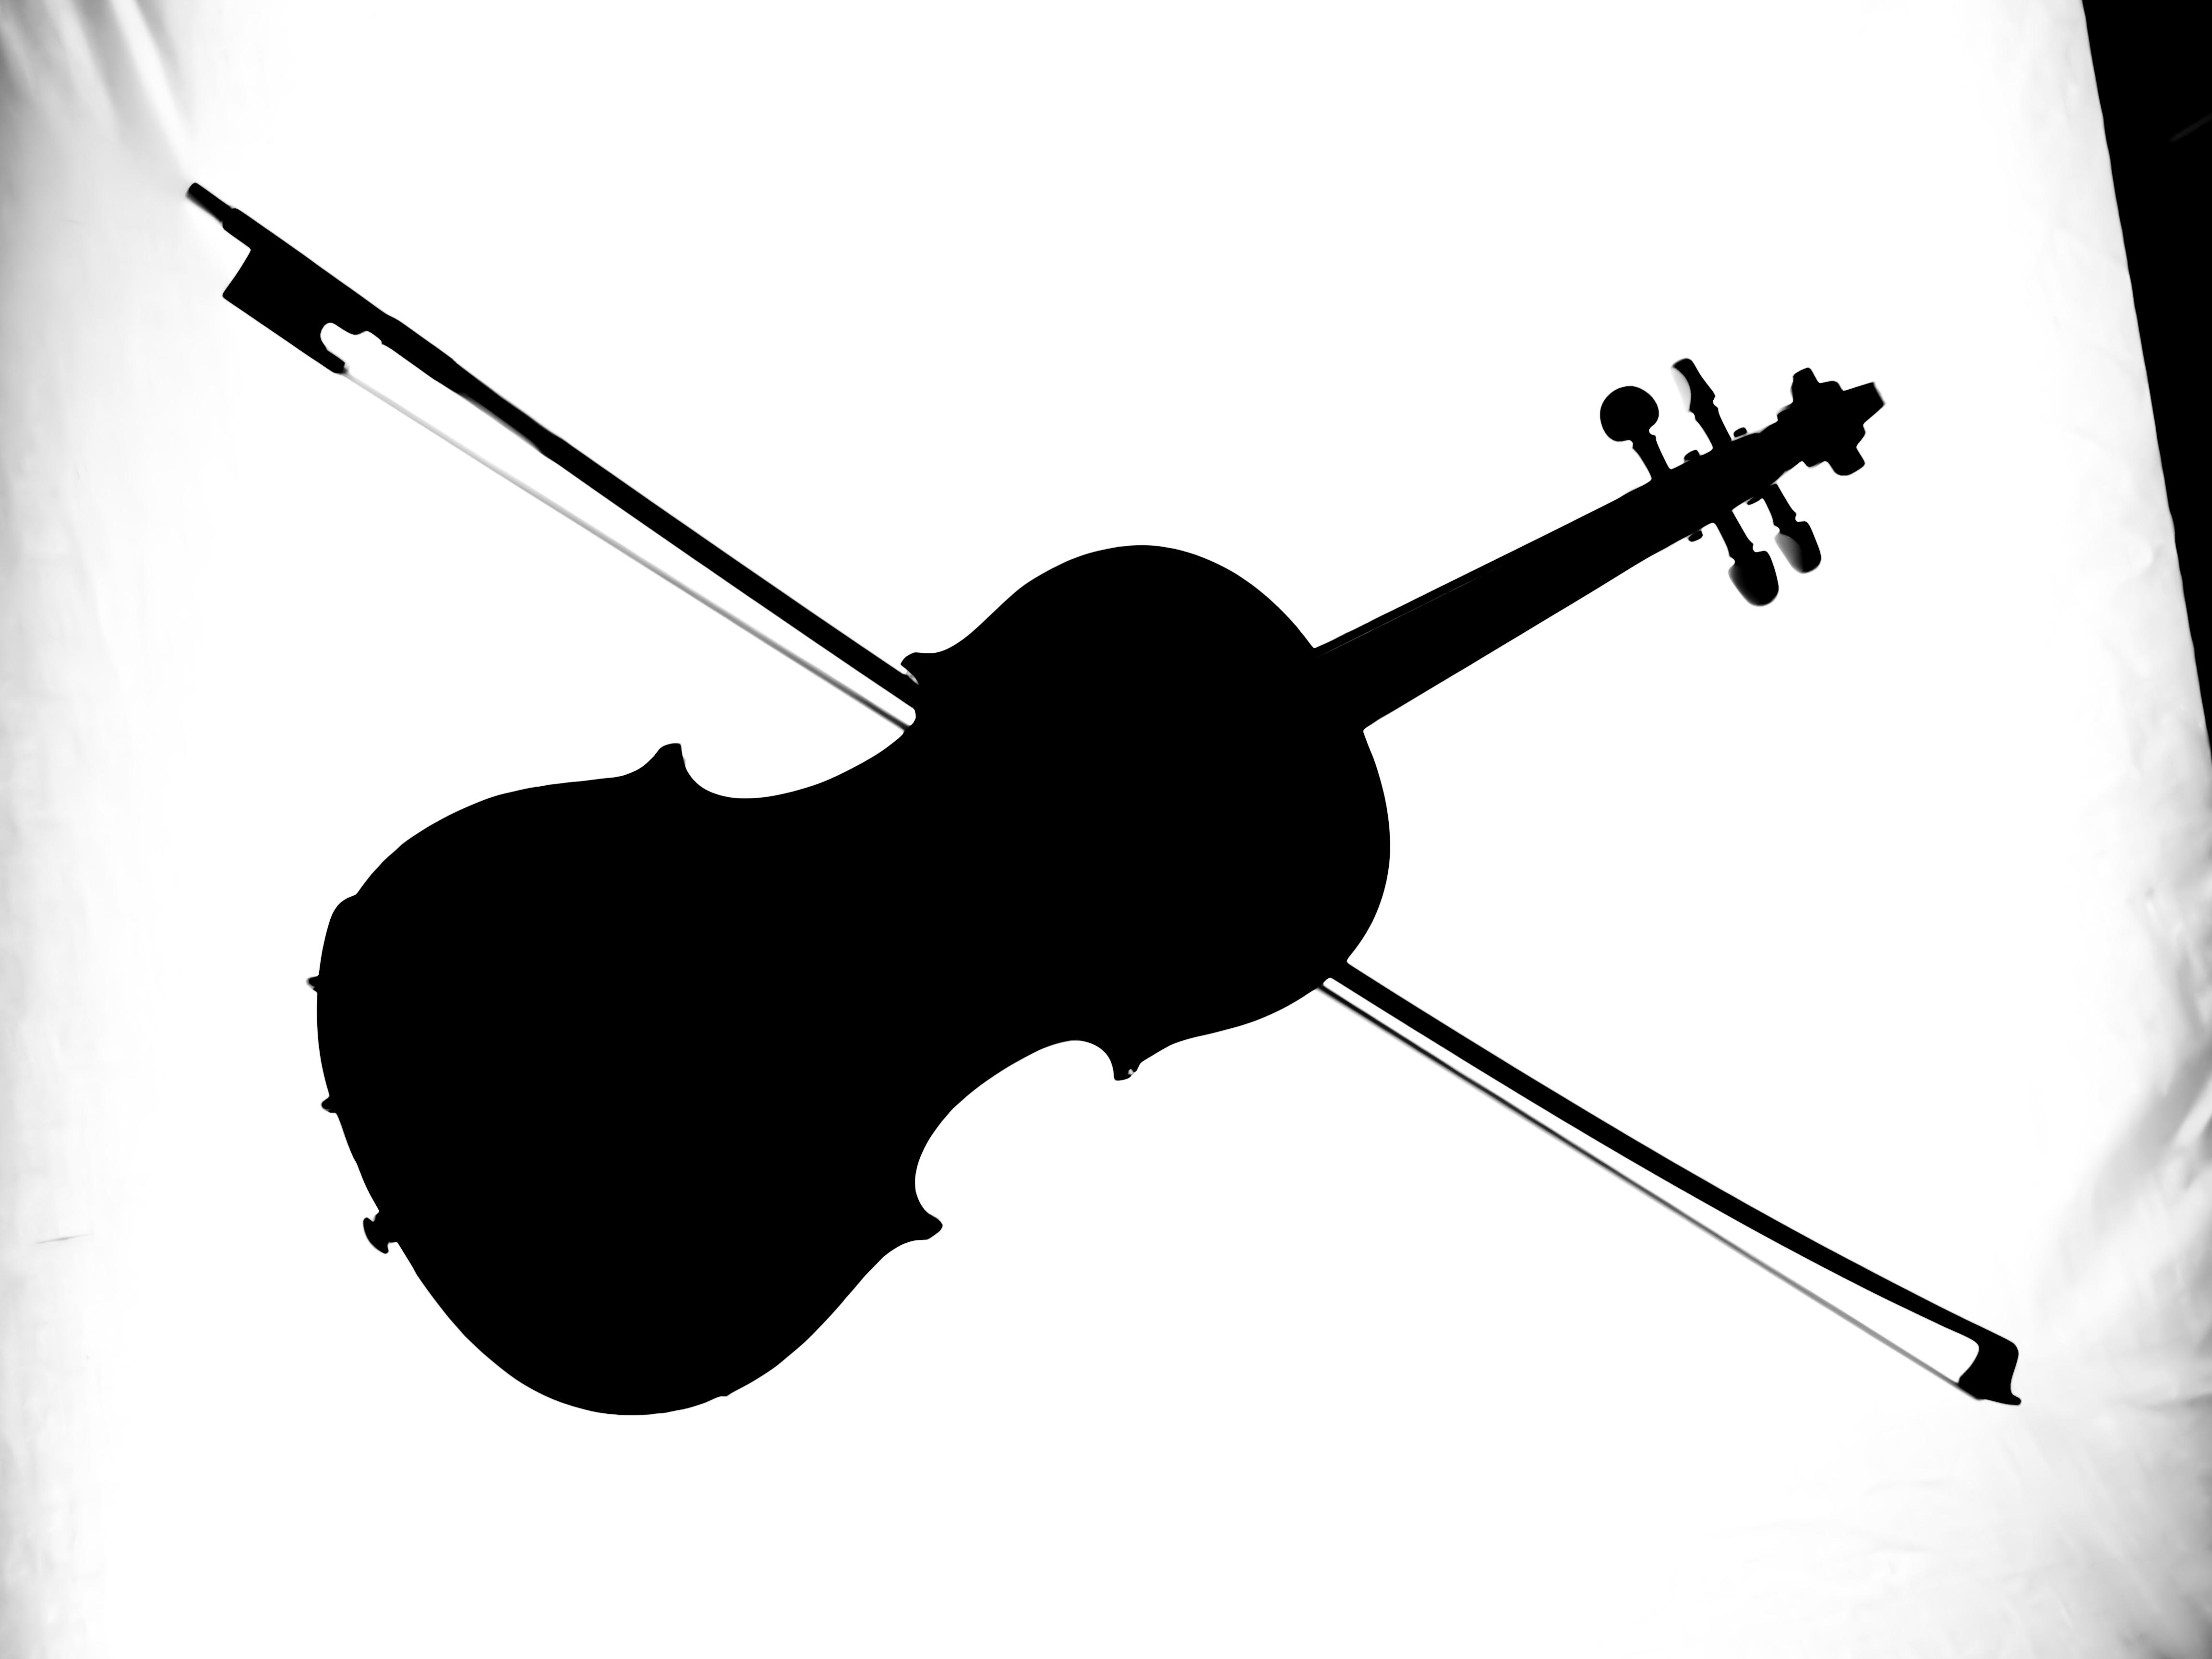 Violin Silhouette | www.imgkid.com - The Image Kid Has It!